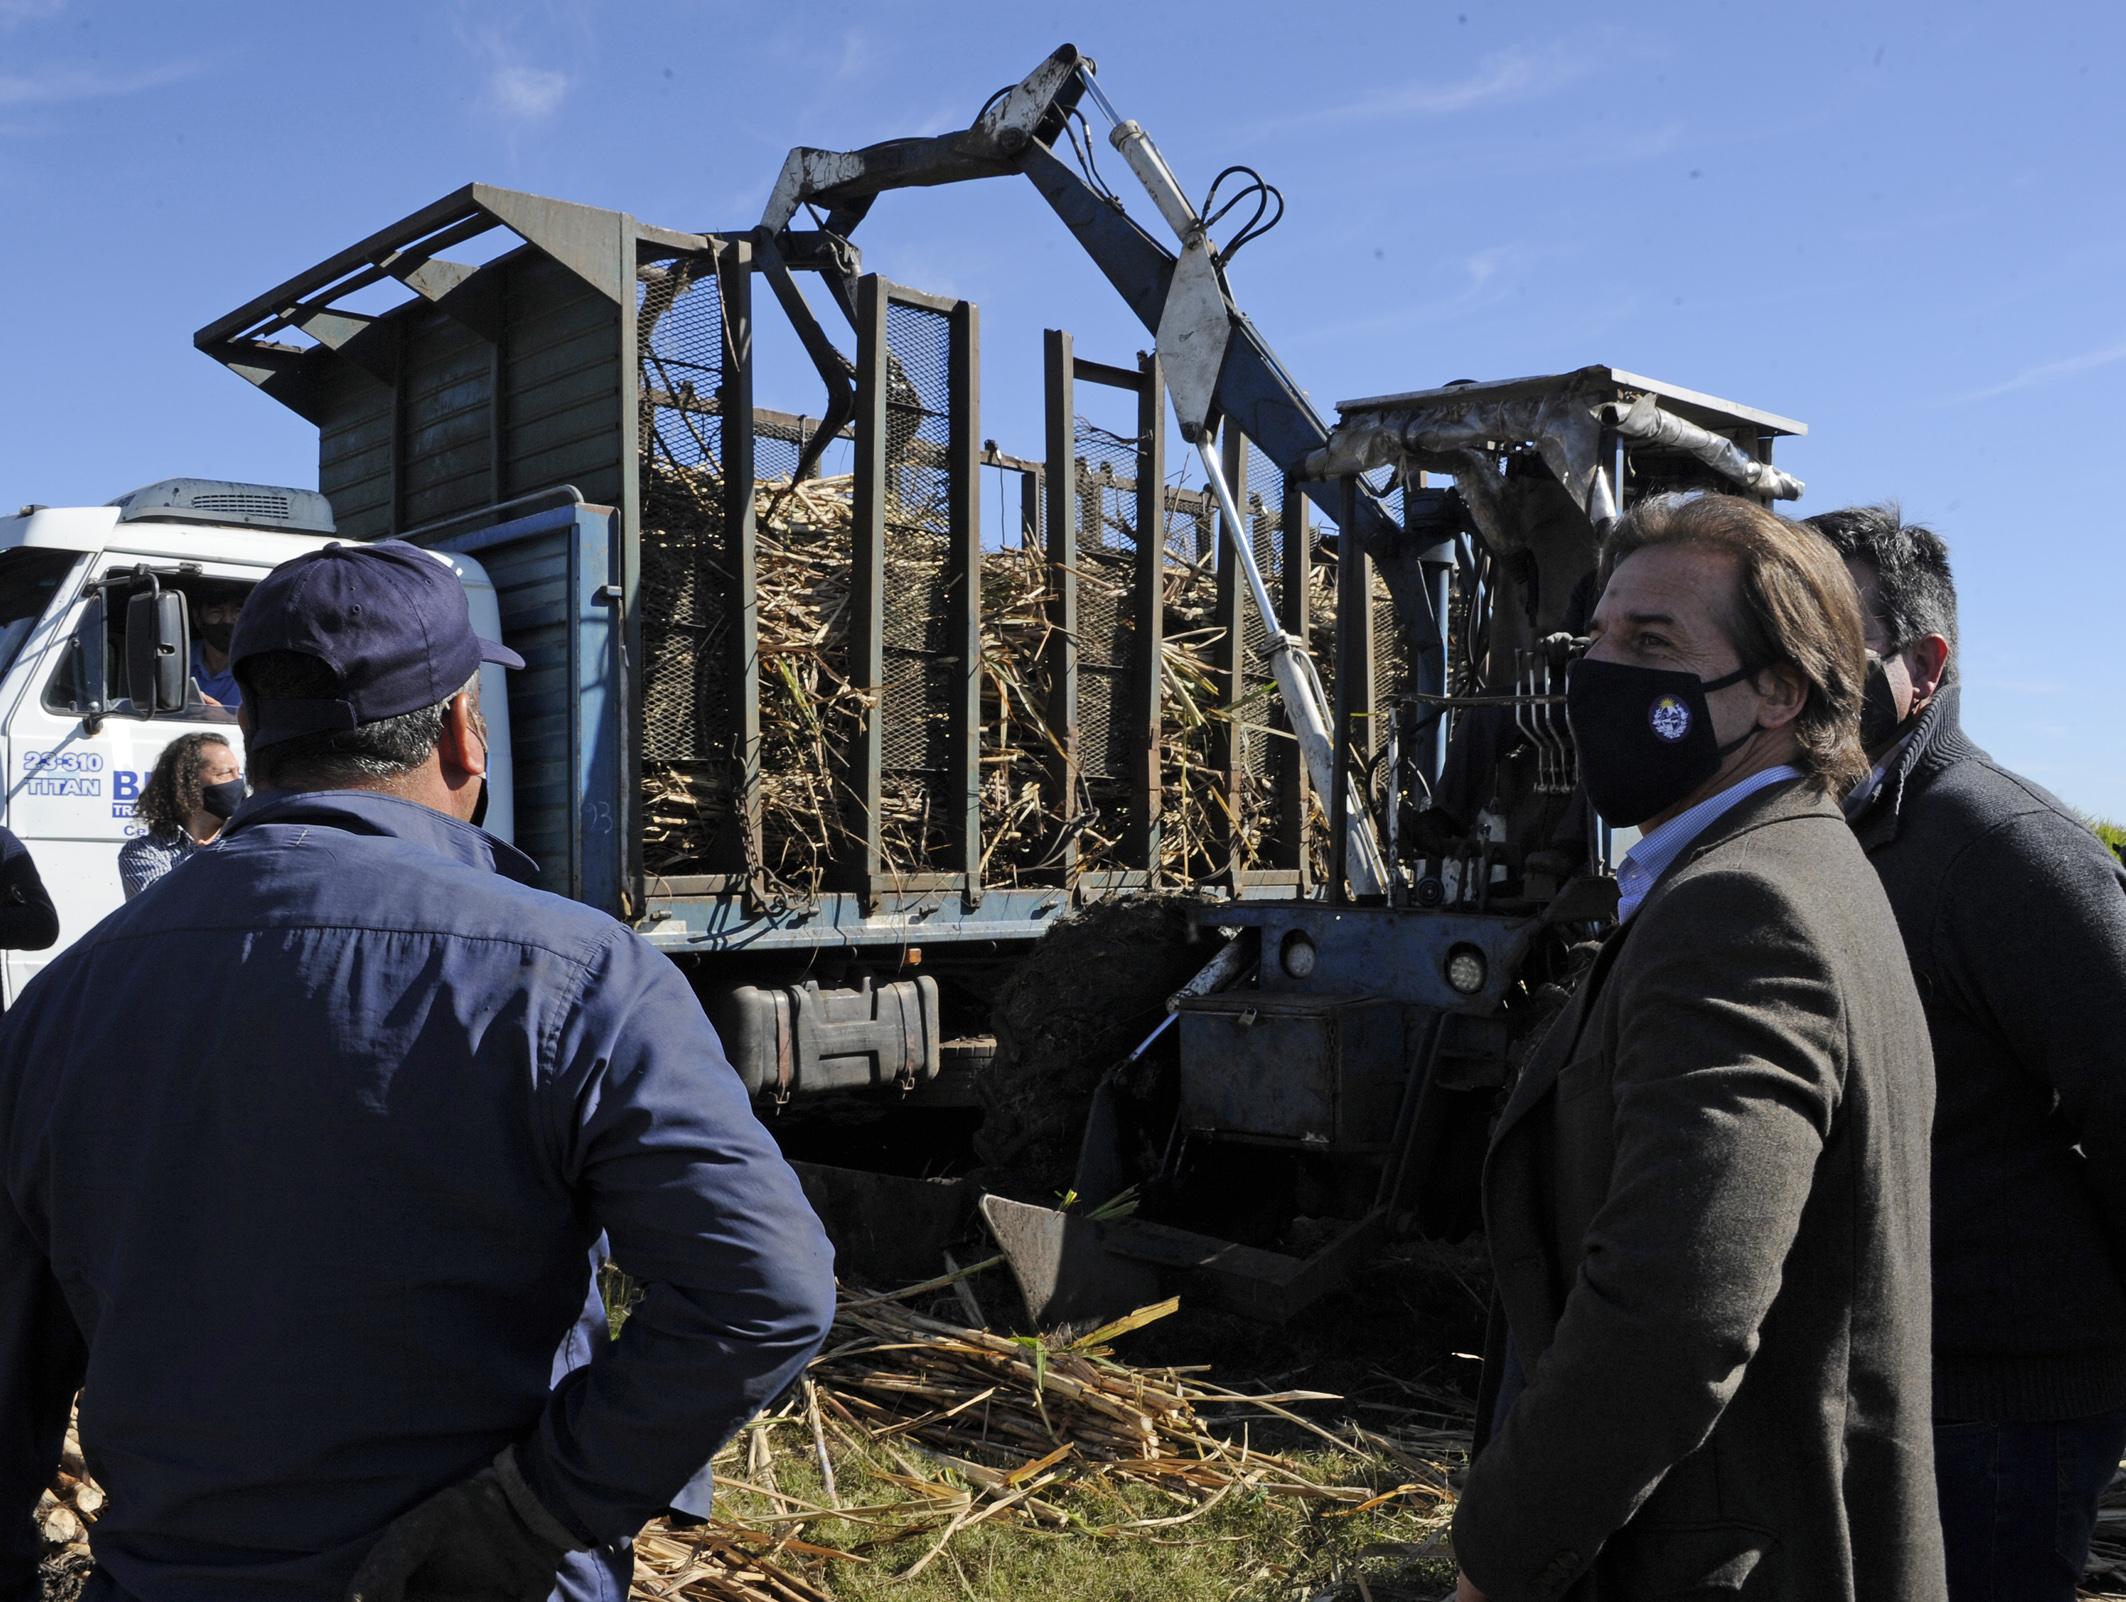 Lacalle Pou, en zafra de la cosecha de caña de azúcar en Bella Unión